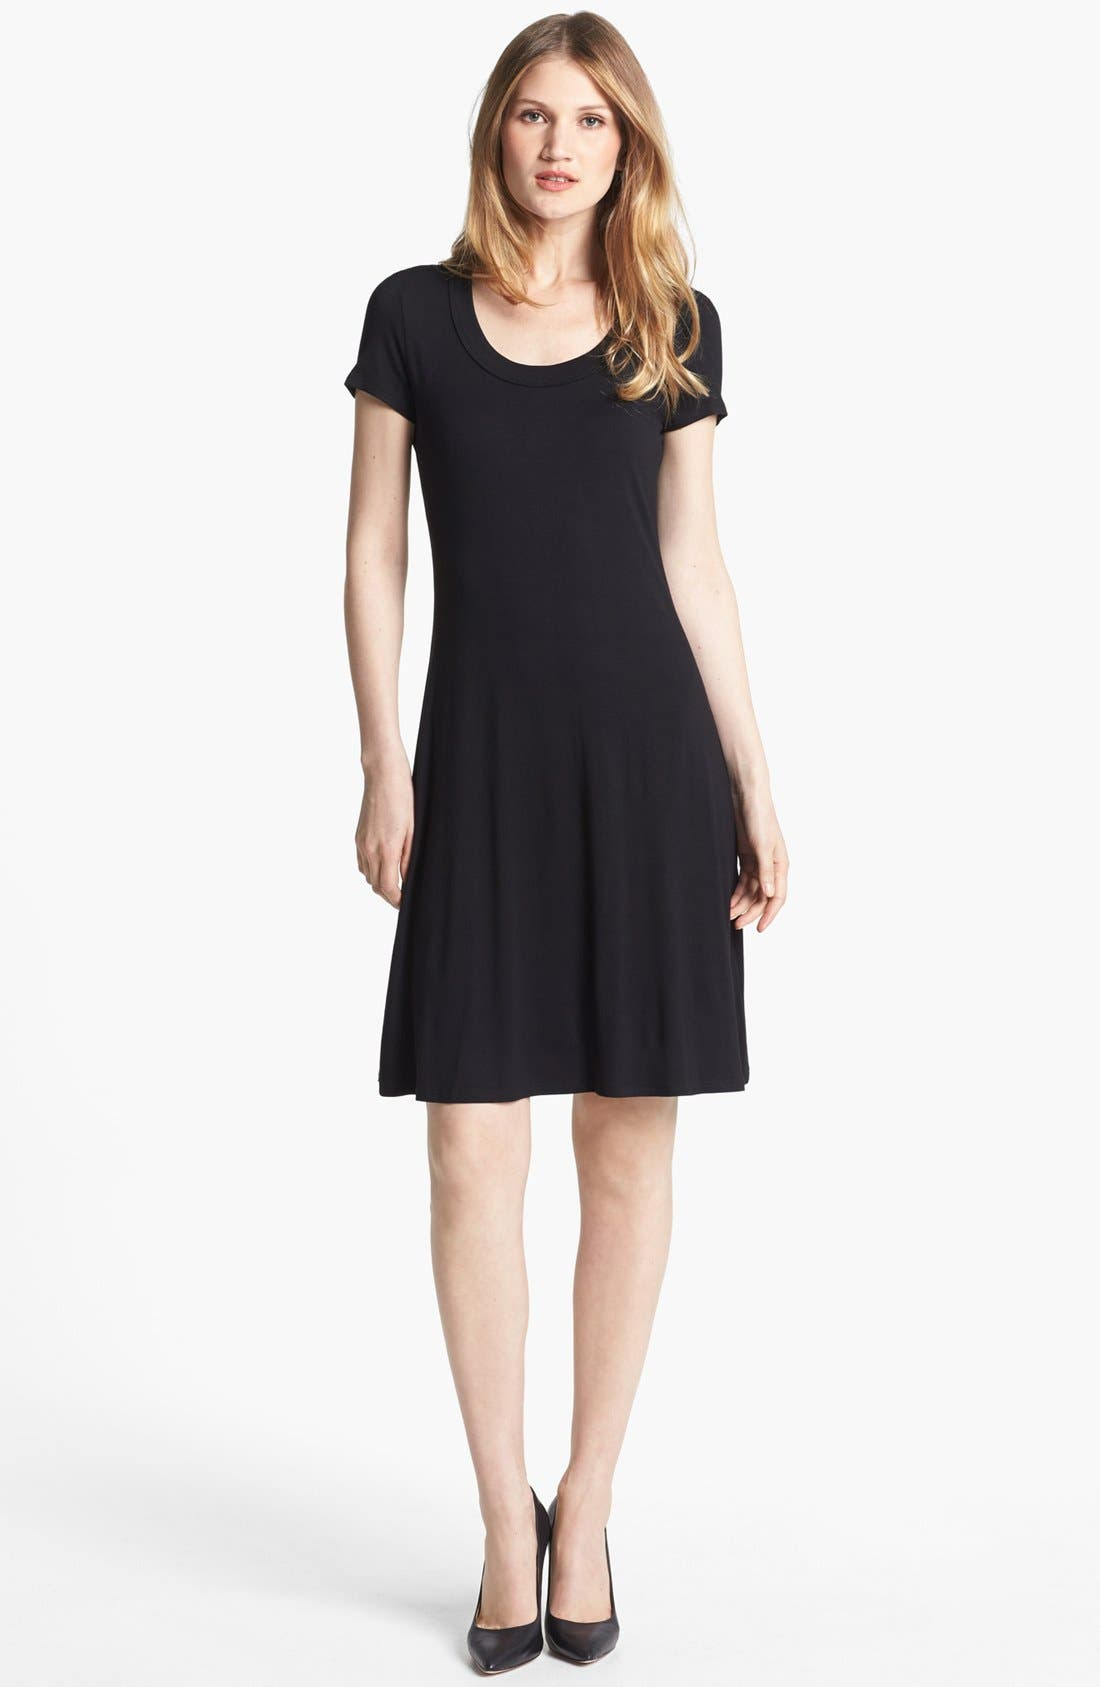 Alternate Image 1 Selected - Karen Kane Scoop Neck Jersey Dress